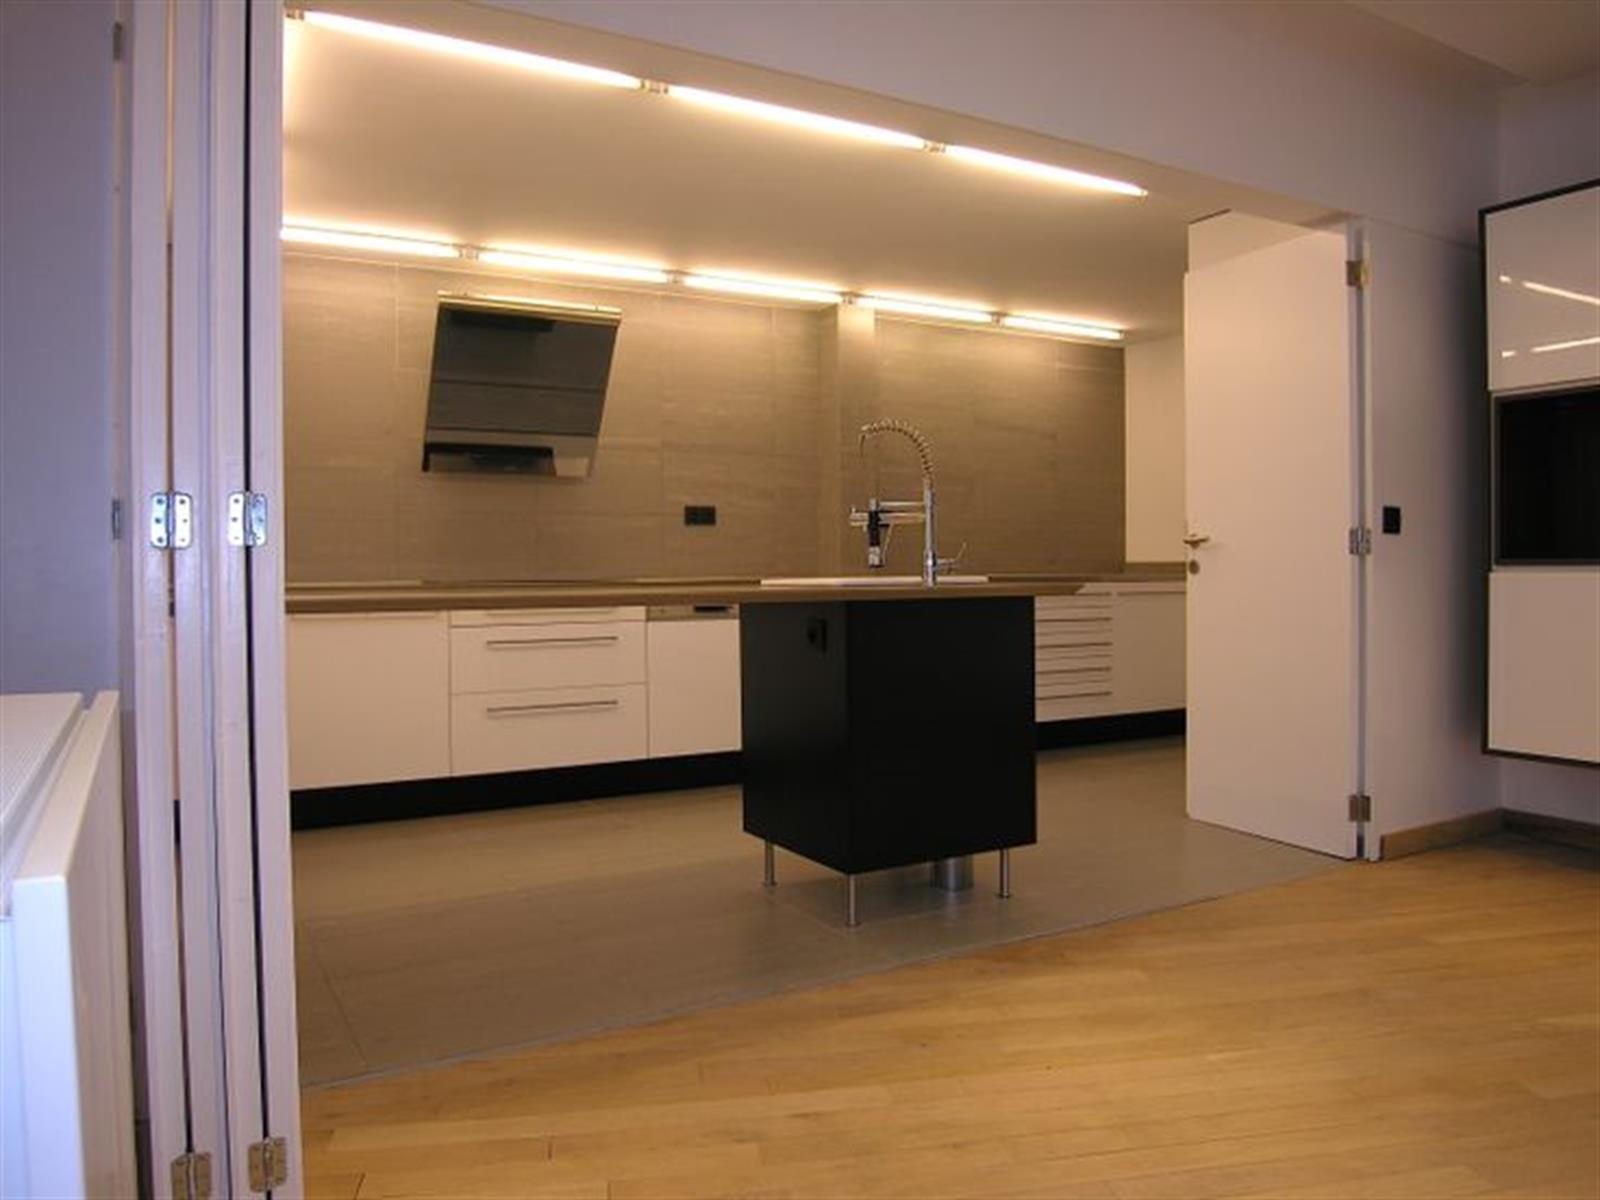 House - Etterbeek - #4365368-7